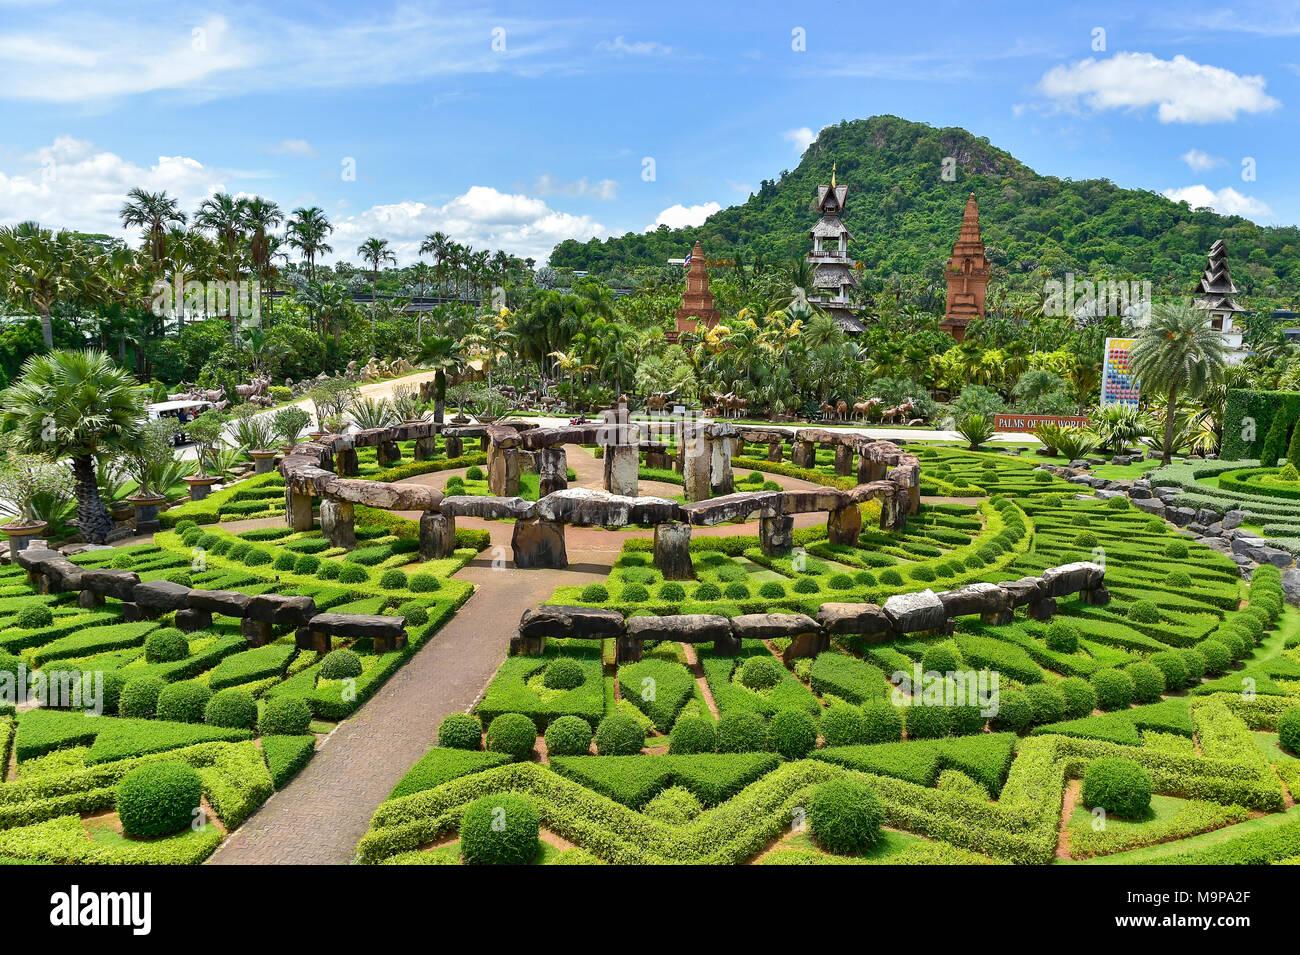 Imitation Stonehenge, Nong Nooch Tropical Botanical Garden, Pattaya, Thailand - Stock Image